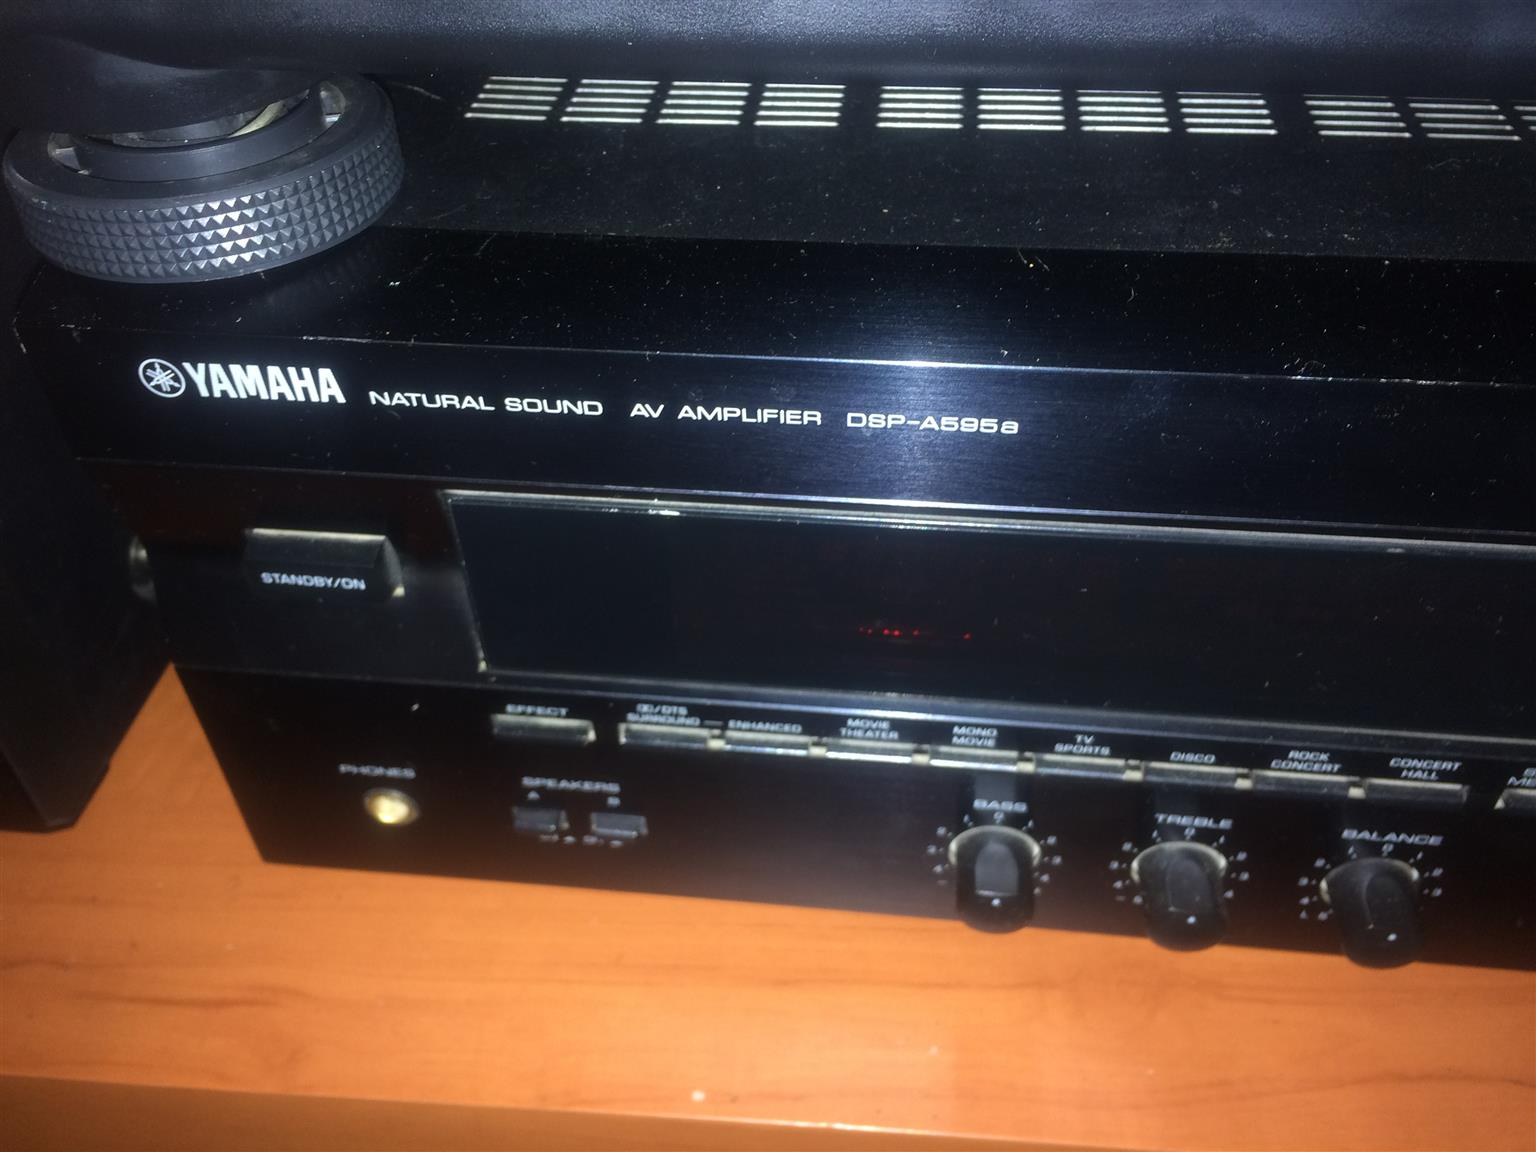 Yamahadsp595a